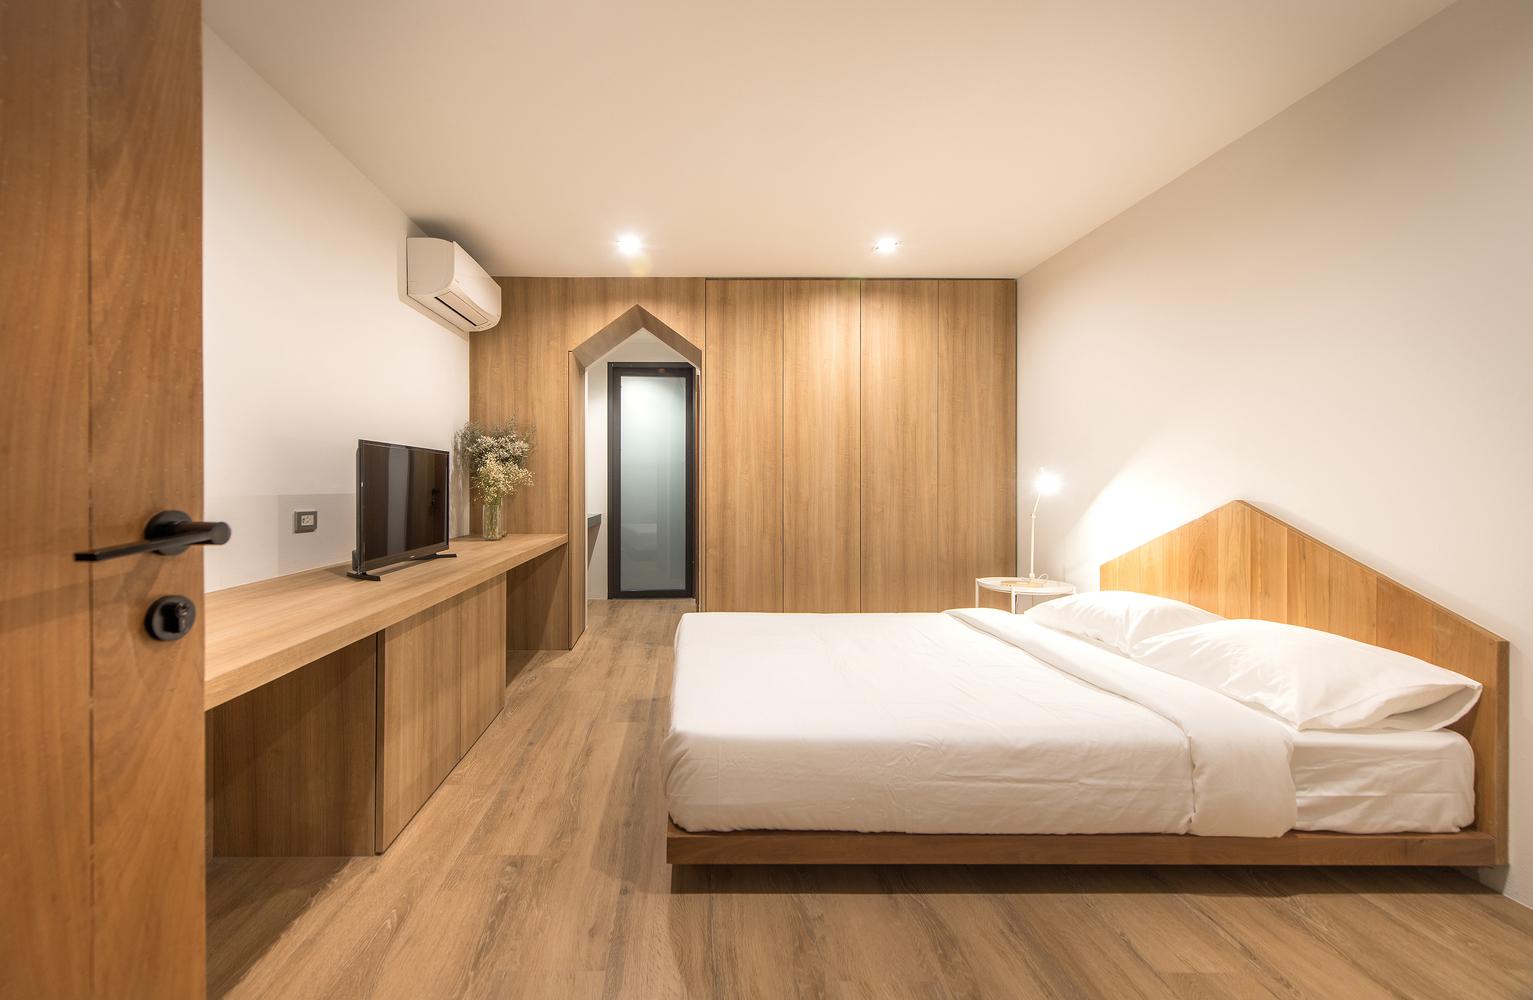 căn hộ cho thuê Hachi elledecorationvn 15